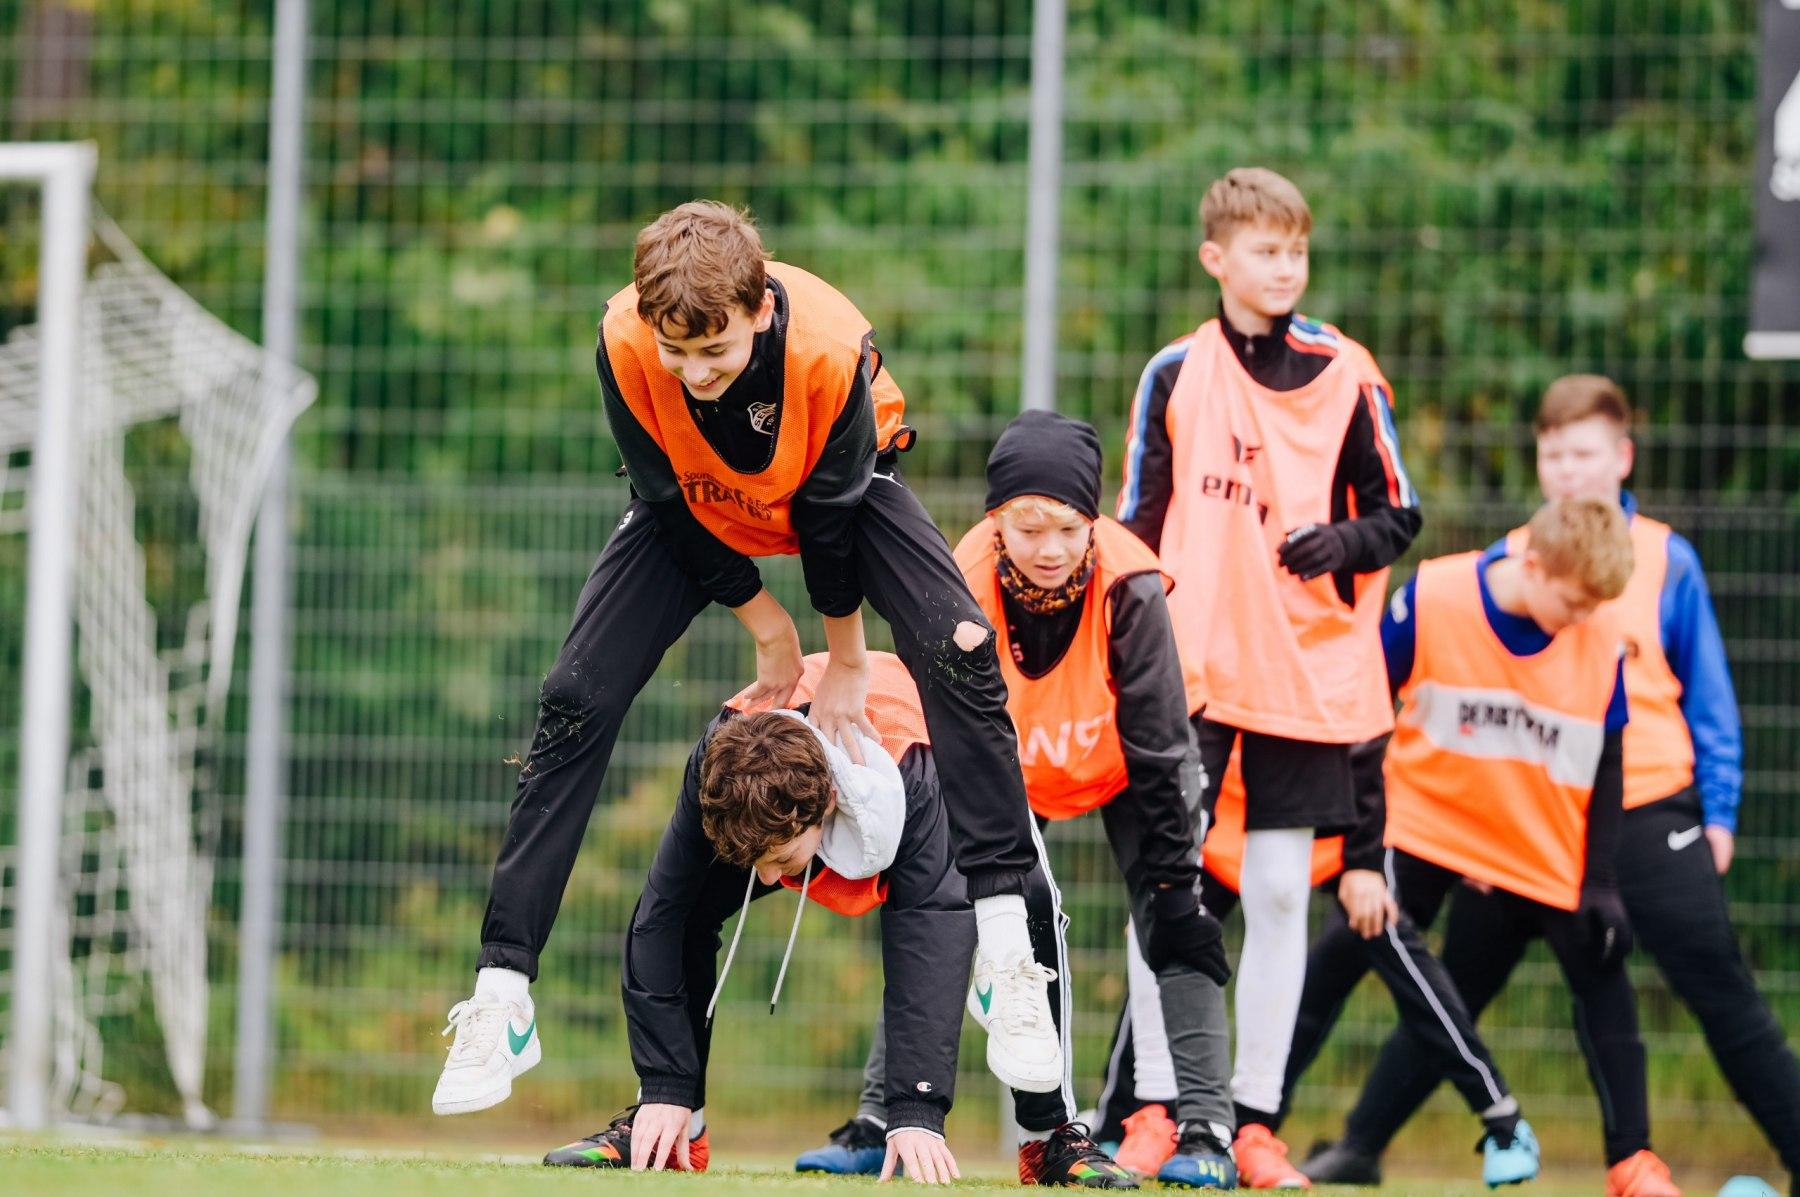 Fußballschule SW Sende, Herbstferien 2021. Foto: Besim Mazhiqi